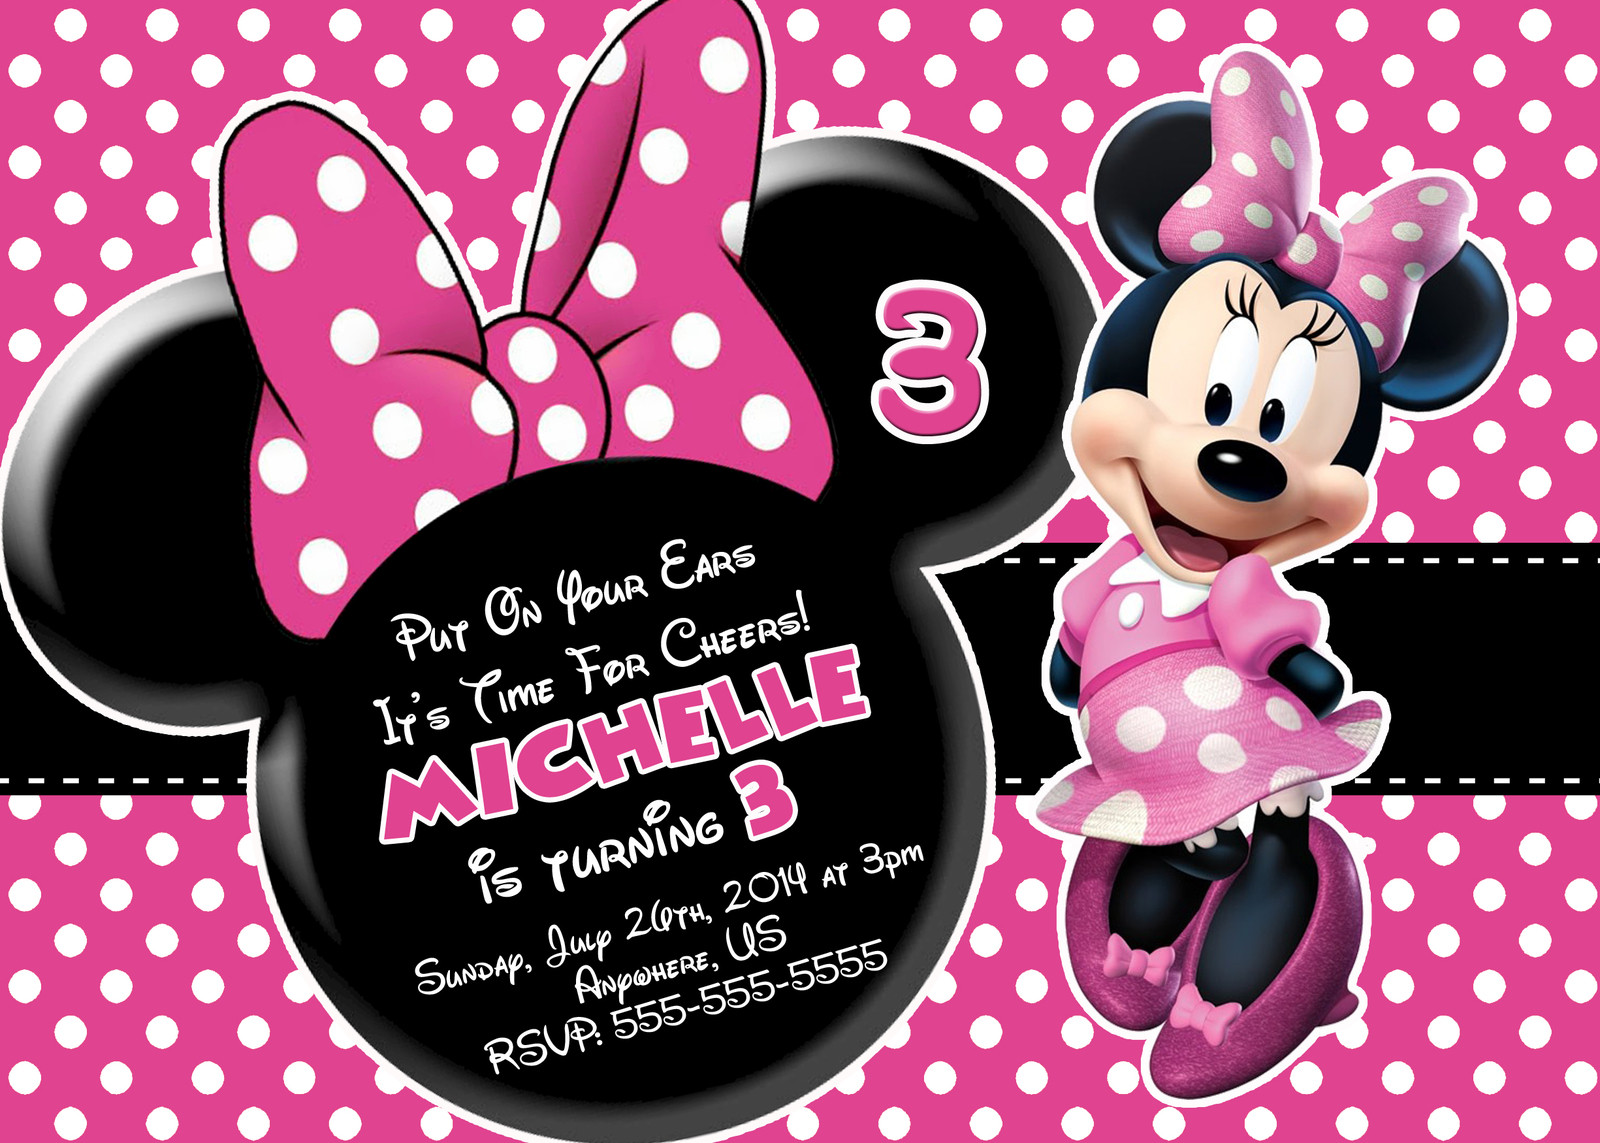 Minnie Birthday Invitations  Minnie Mouse Printable Birthday Invitations – FREE